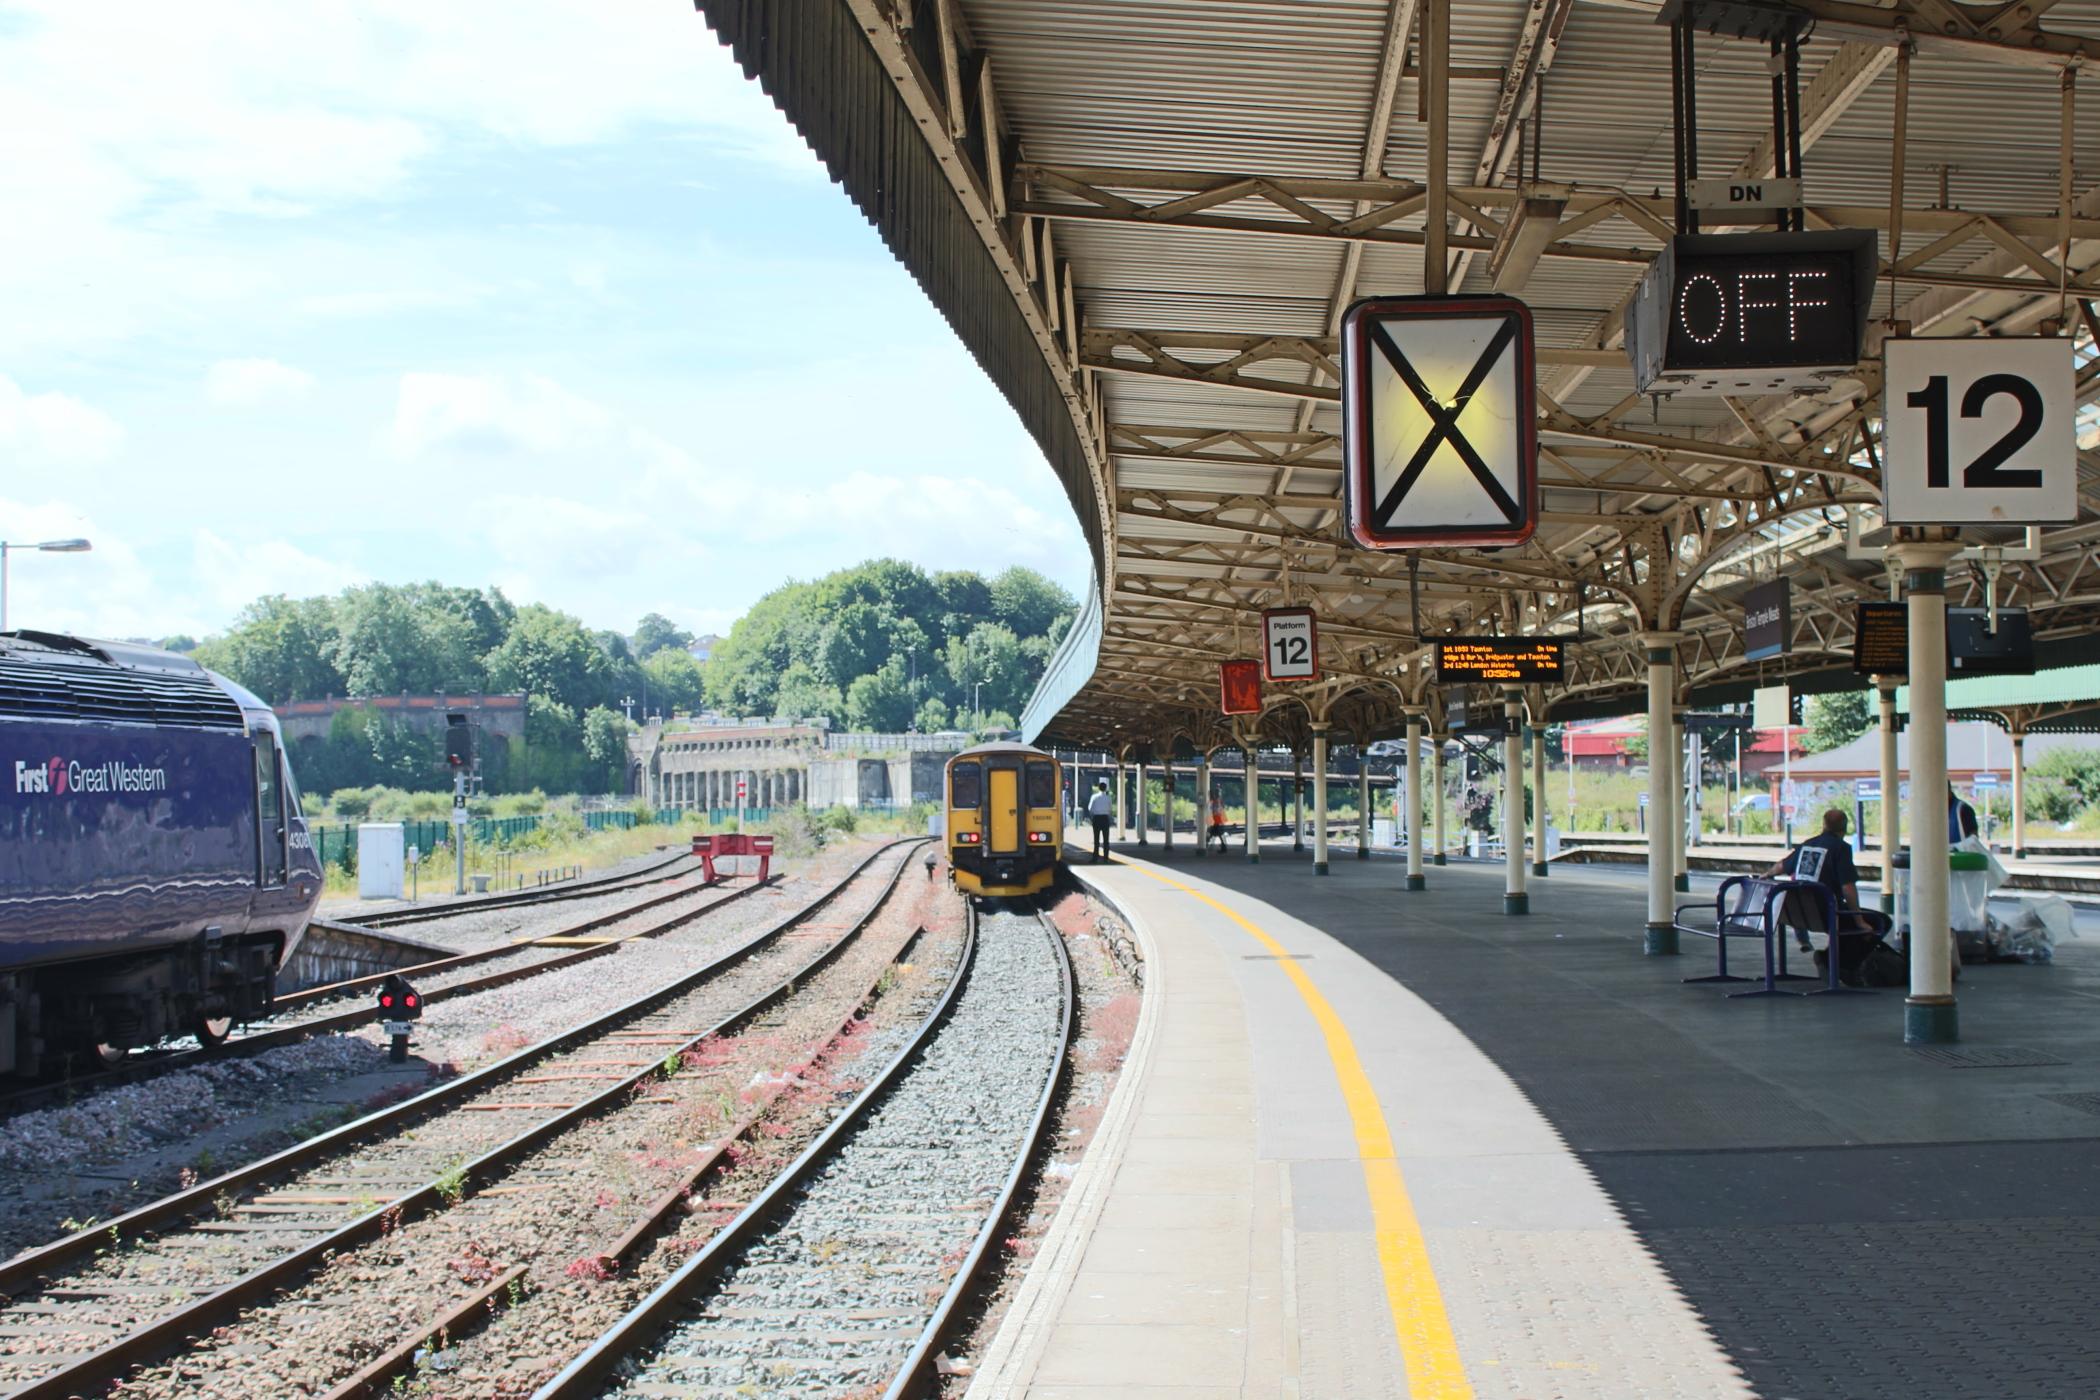 Bristol Area Signalling Renewals Rail Engineer Relay Terminal Transportation